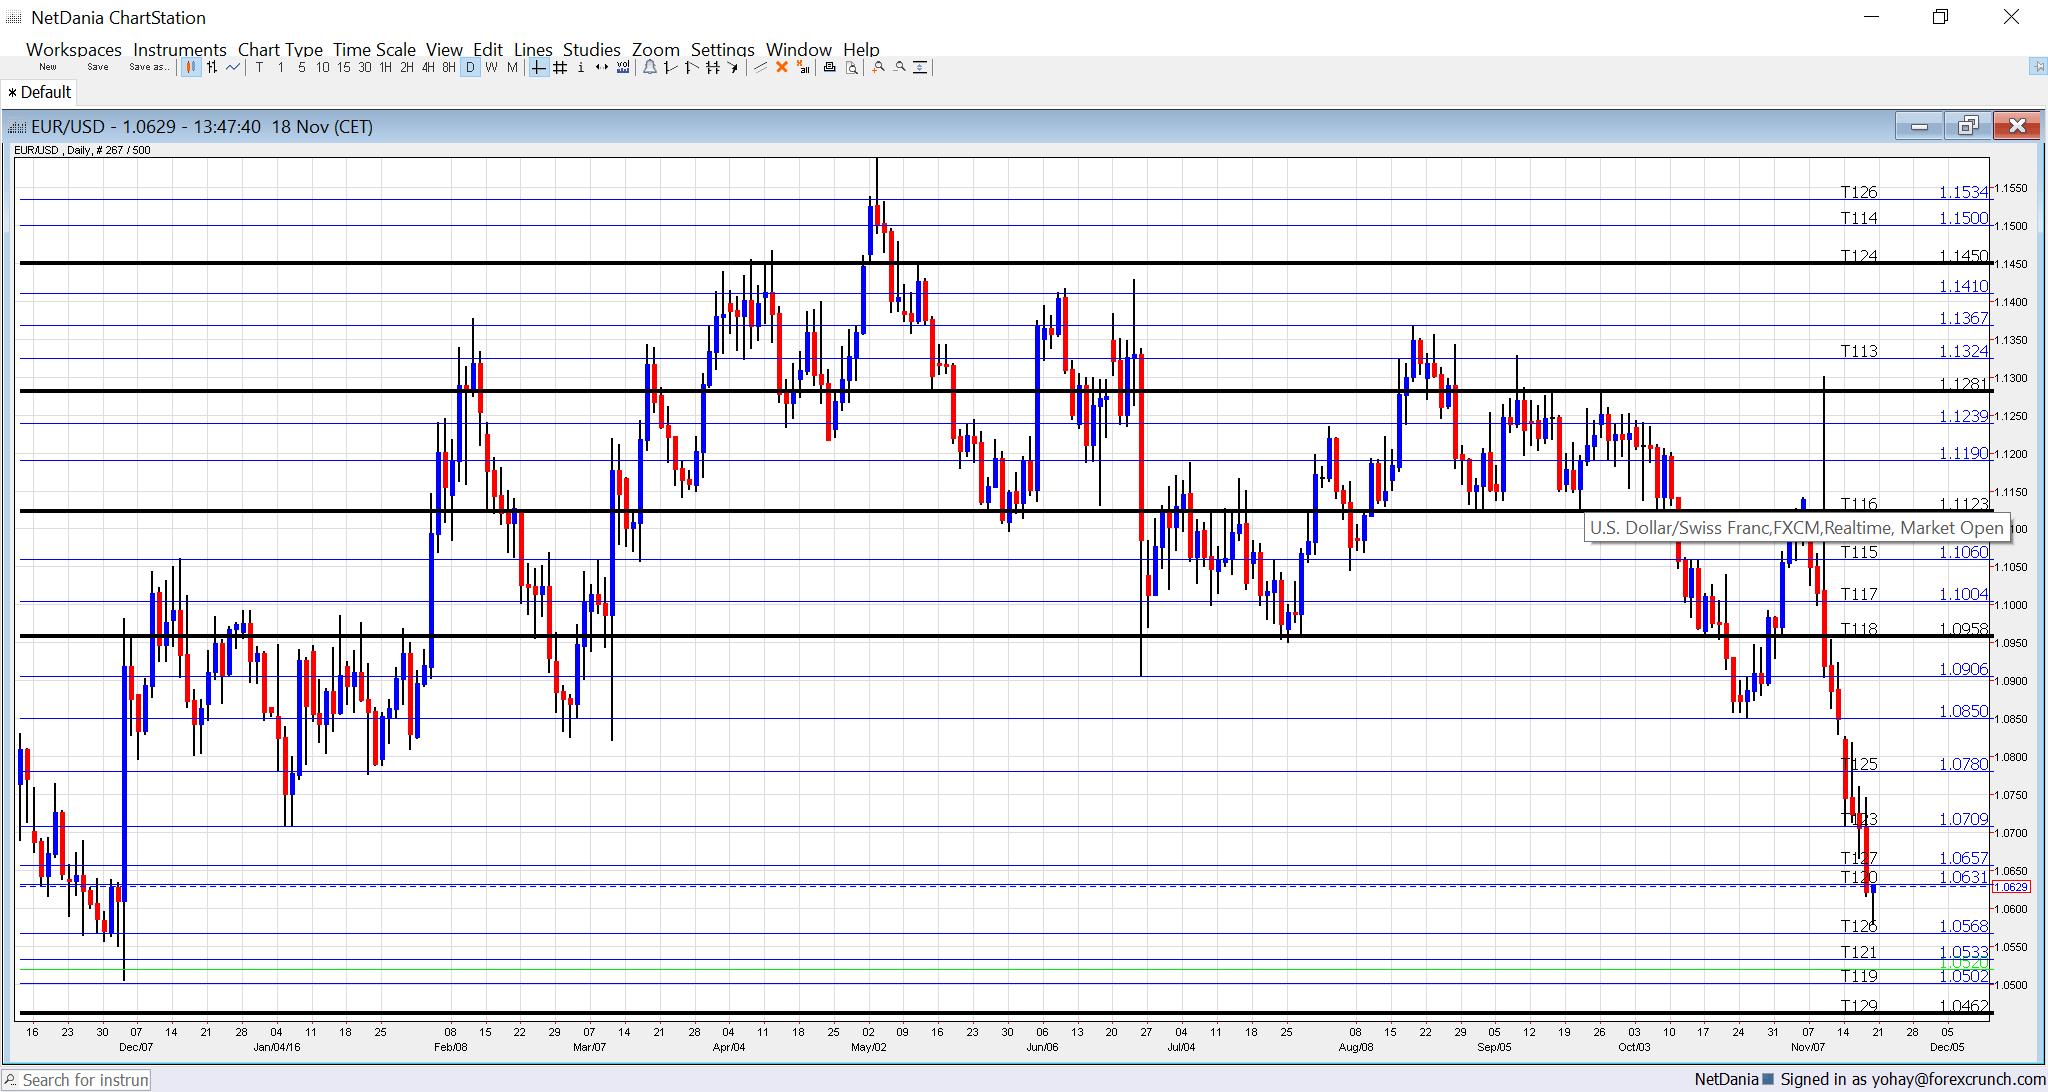 eurusd-technical-analysis-november-21-25